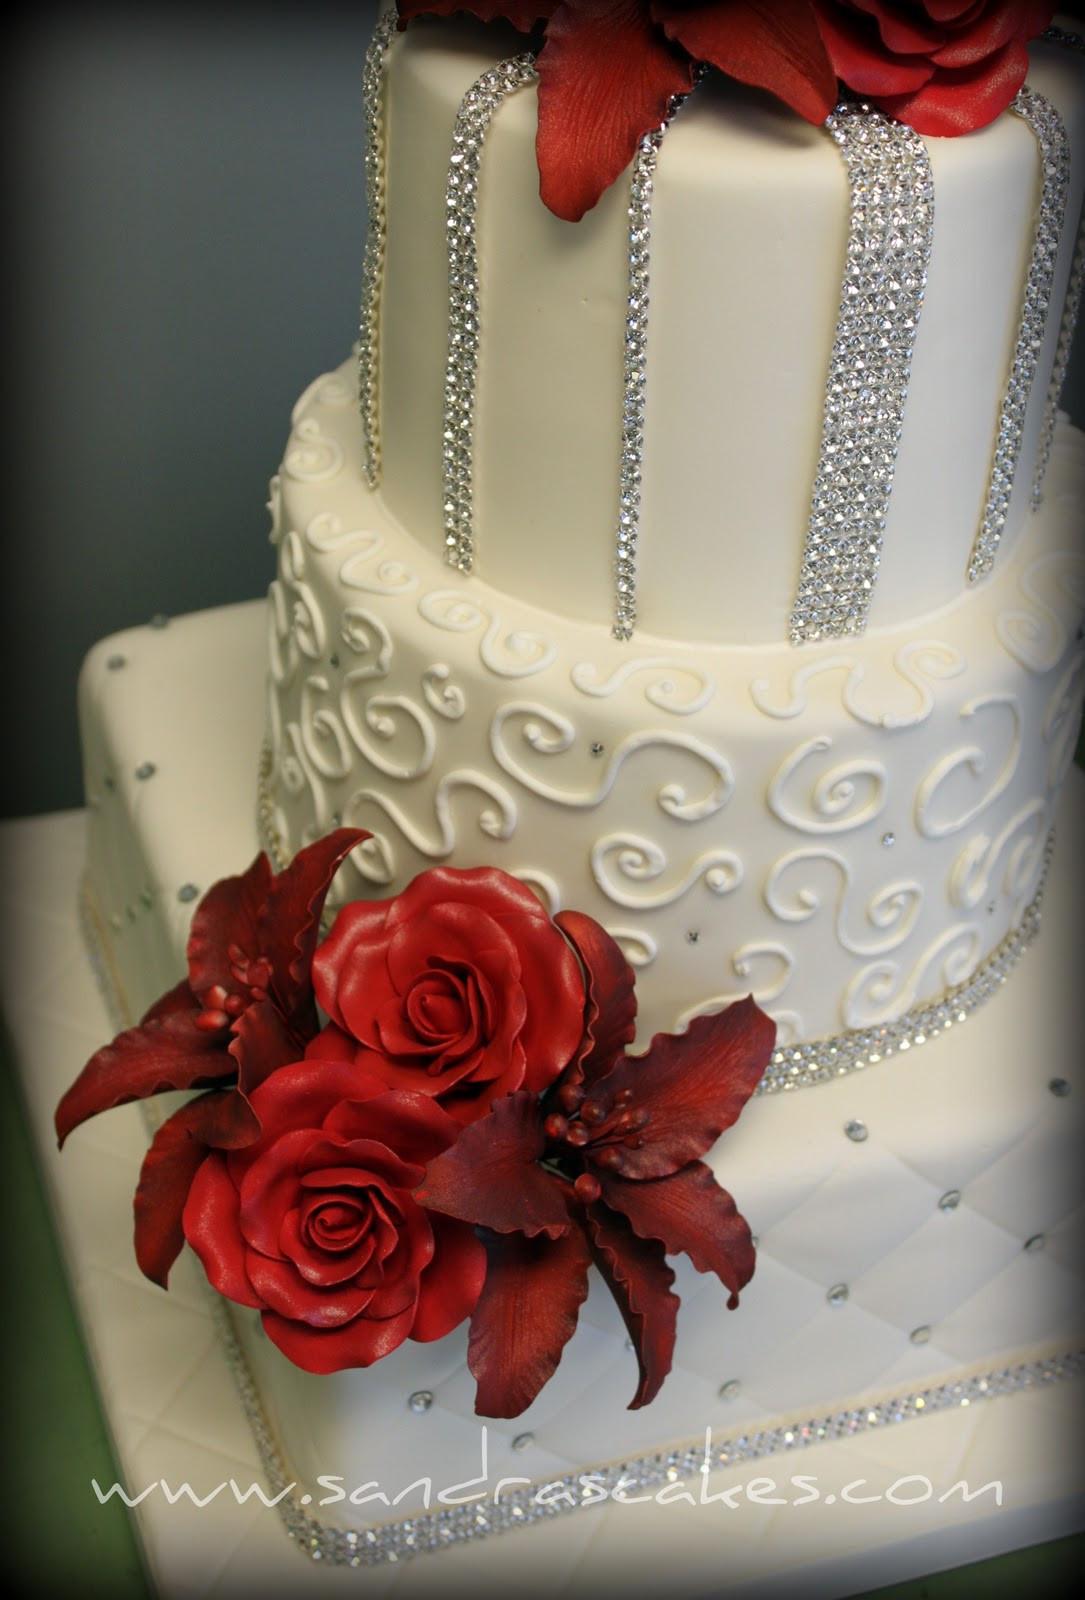 Exquisite Wedding Cakes  Exquisite Wedding Cakes